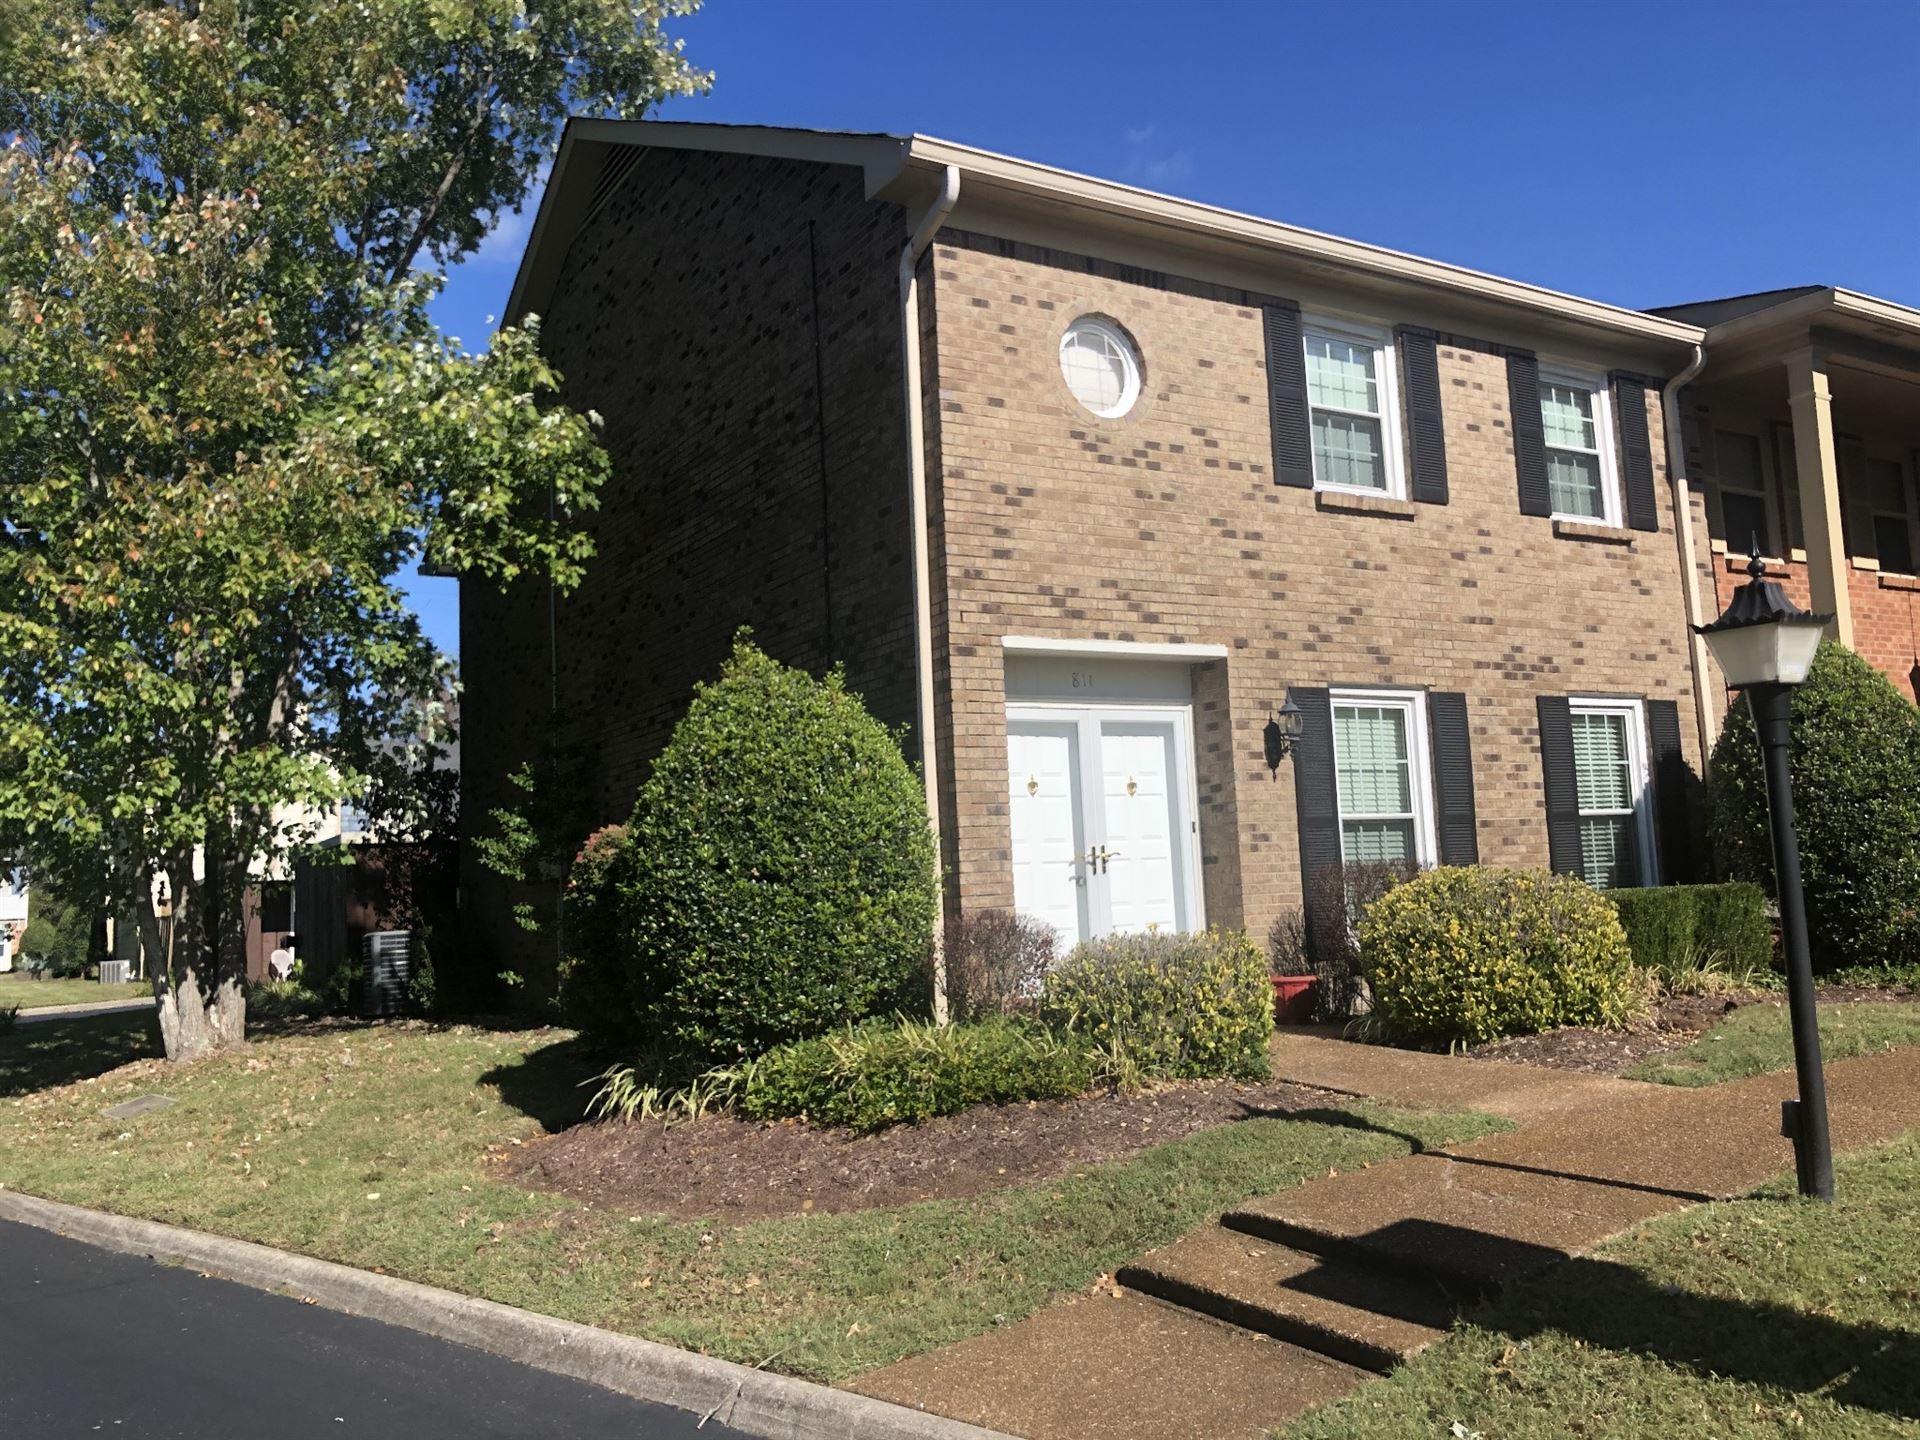 811 General George Patton Rd, Nashville, TN 37221 - MLS#: 2282582